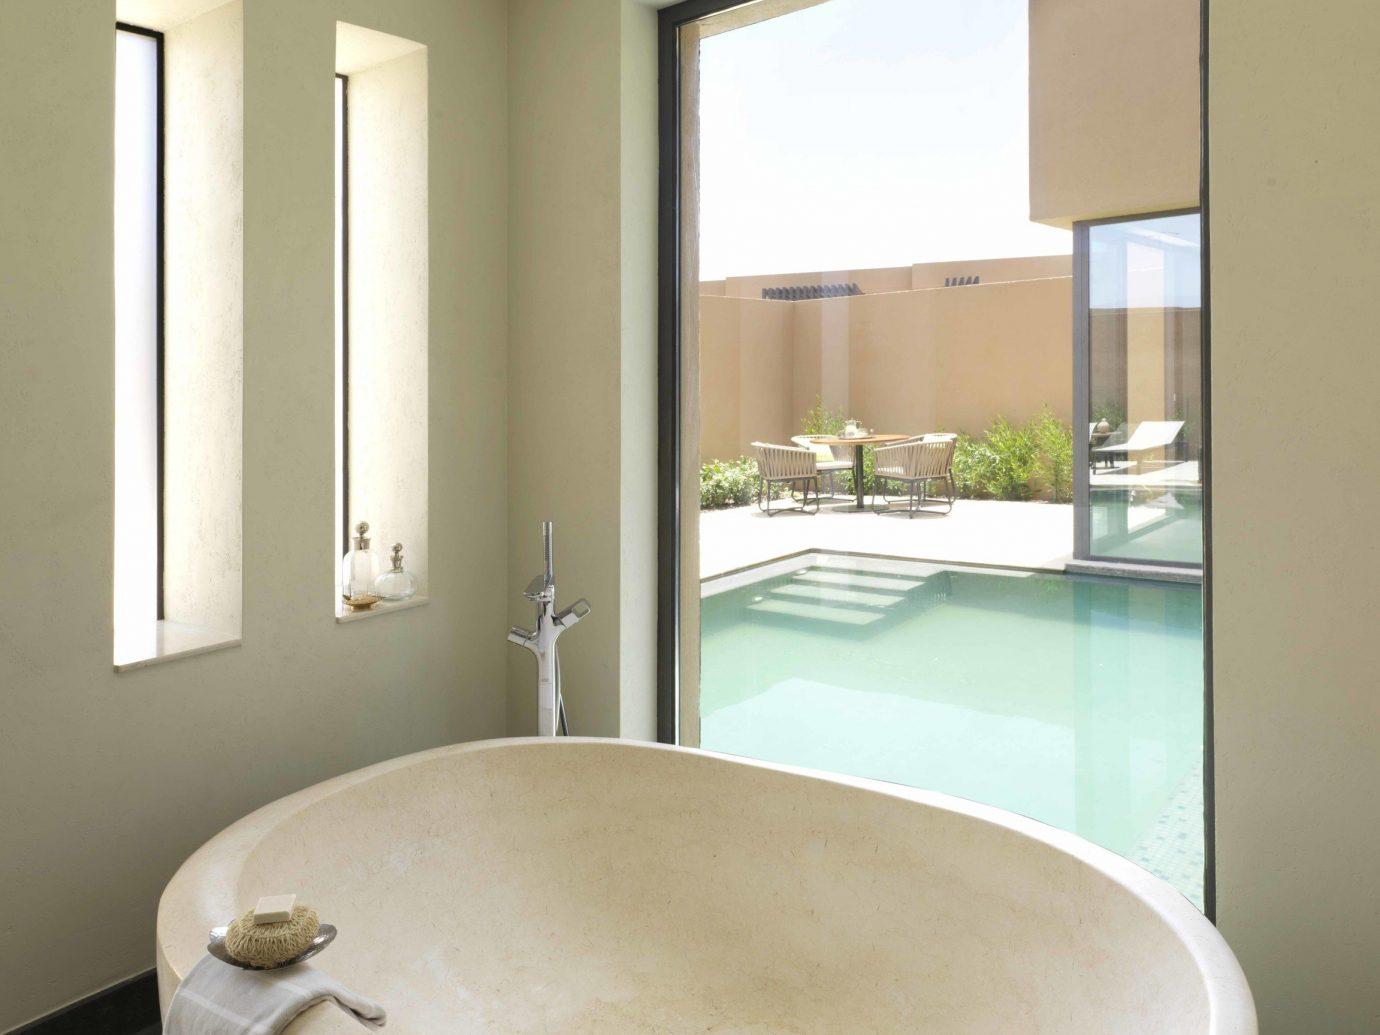 Hotels indoor wall bathroom window floor room bathtub property tub plumbing fixture interior design swimming pool ceiling daylighting bidet flooring Bath